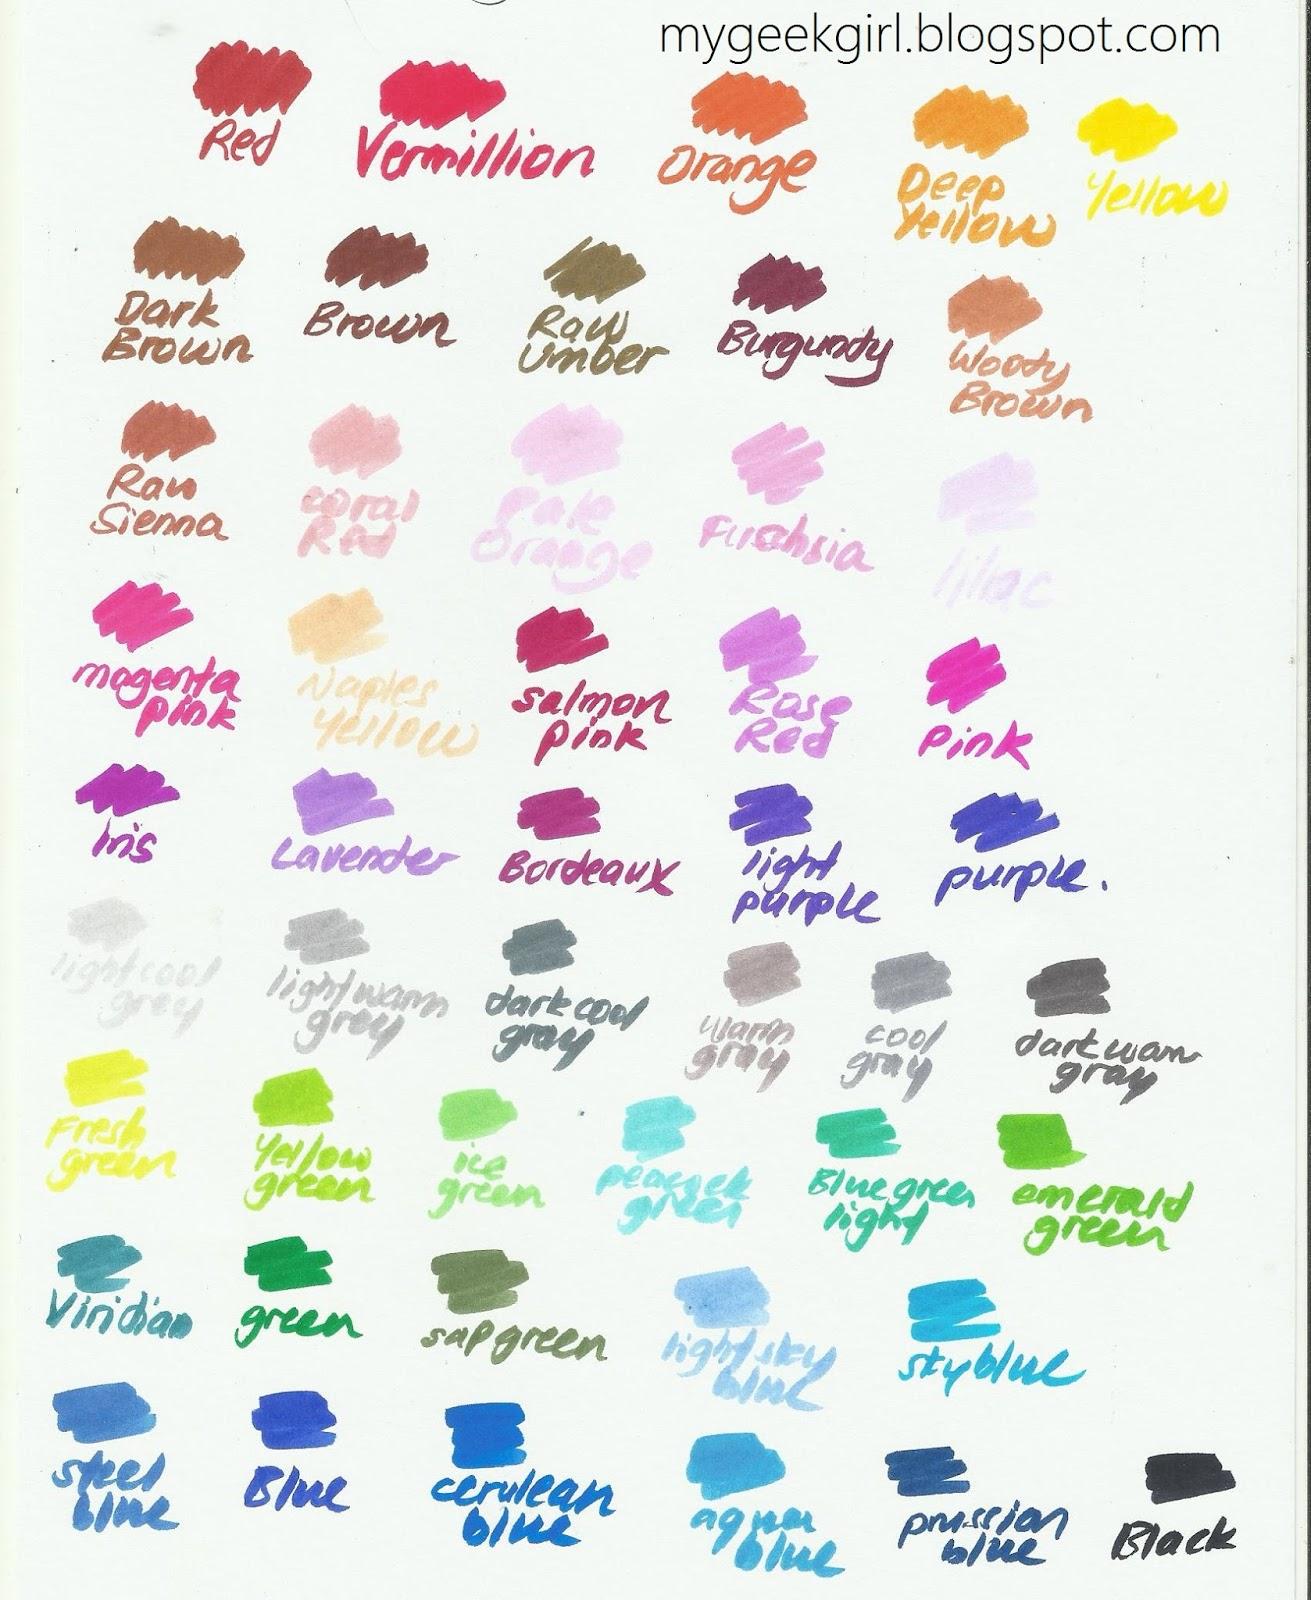 Color My Life: Sakura KOI Colouring Brush 48 Col. Set Review - Kay Kay